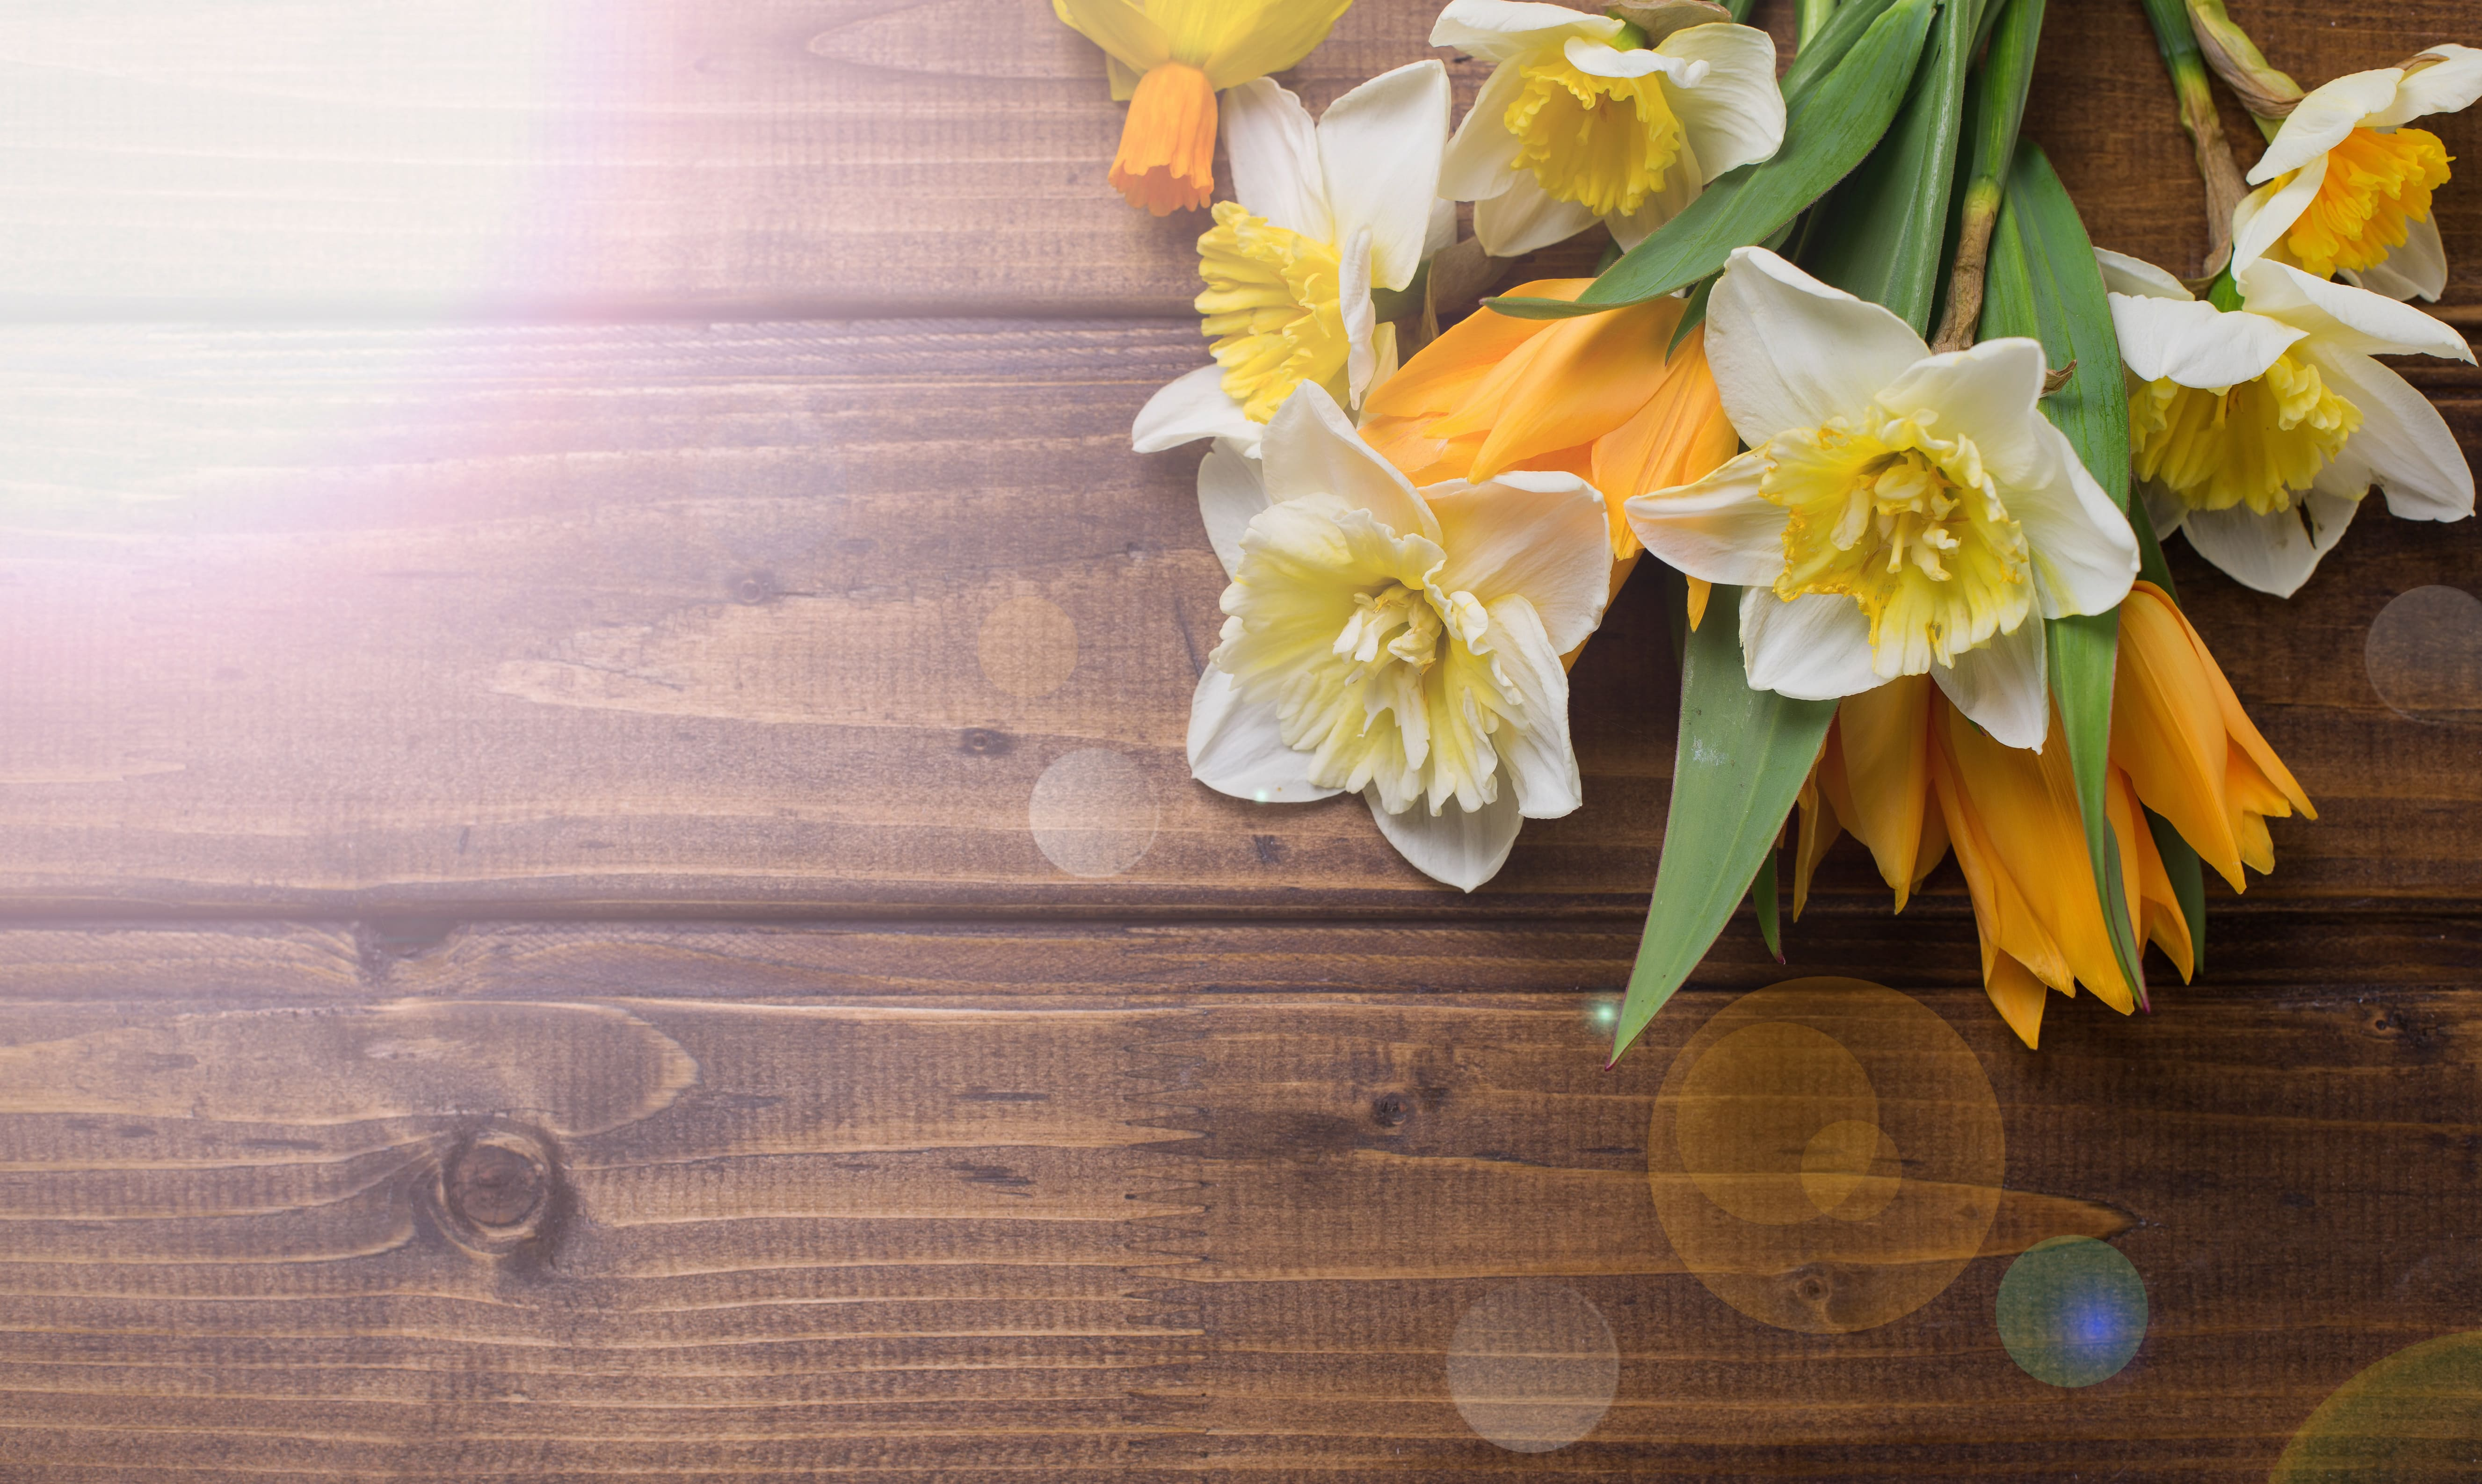 daffodils-photo-73